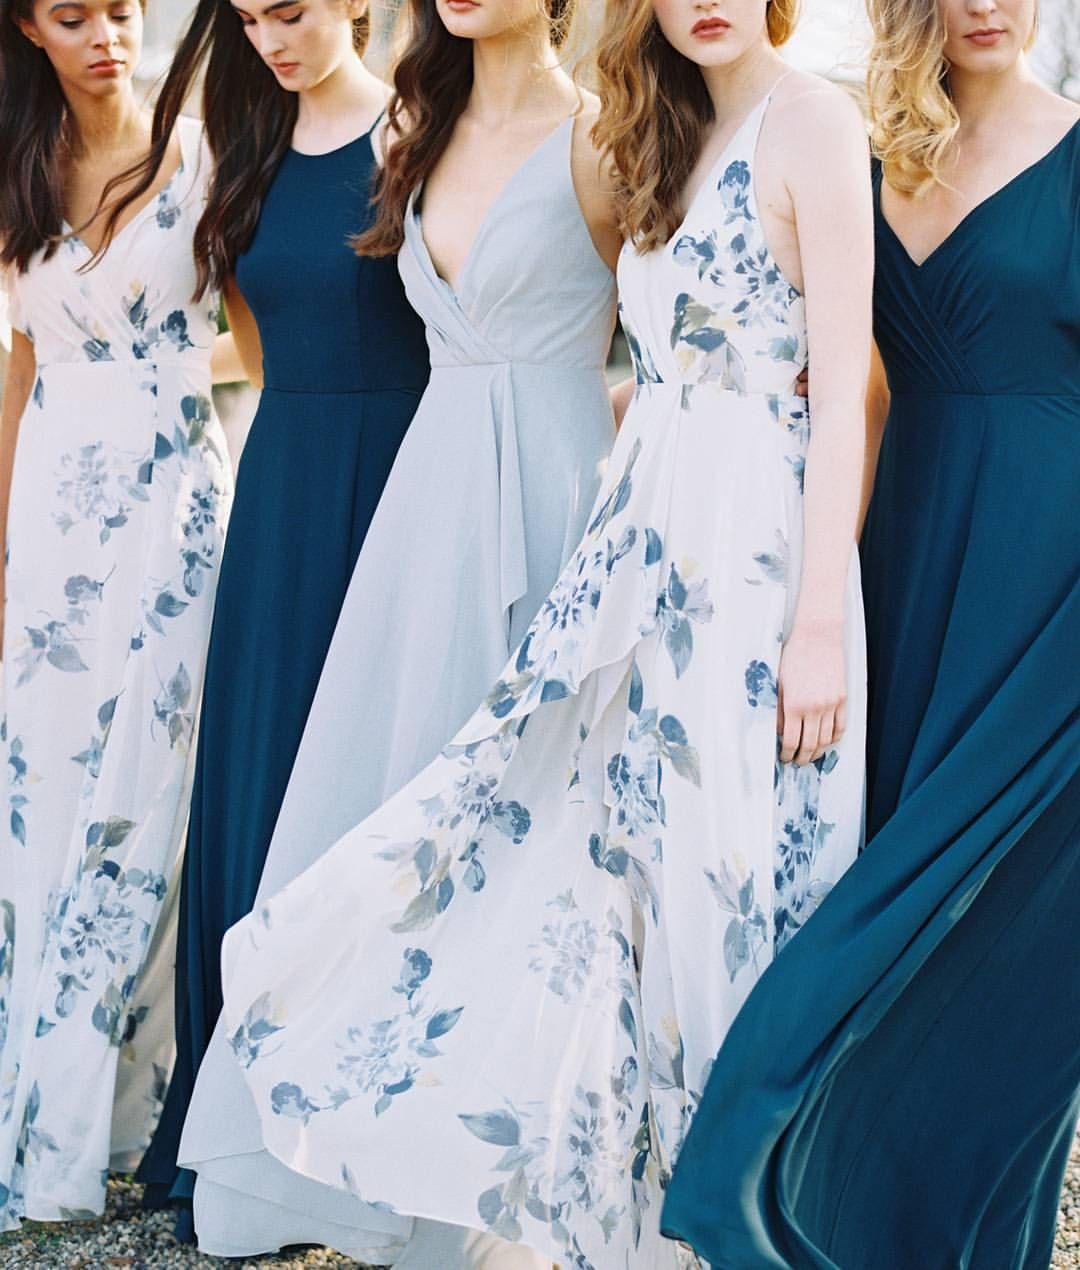 Wedding Bridesmaid Dresses Spring Summer Mix And Match Navy Light Blue F Spring Bridesmaid Dresses Printed Bridesmaid Dresses Floral Bridesmaid Dresses